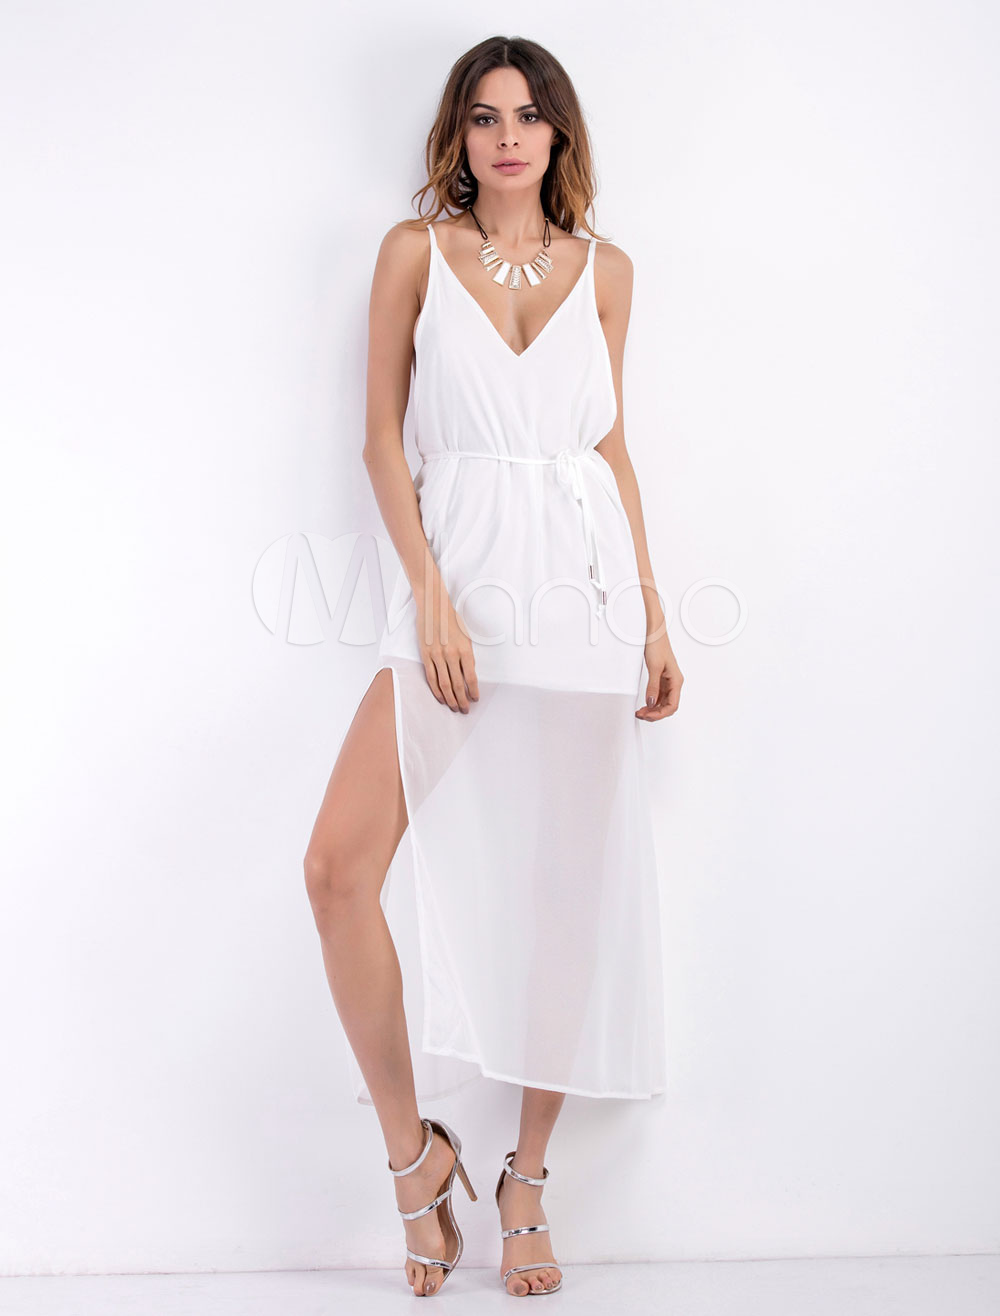 Chiffon Maxi Dress White Strappy V Neck Sleeveless Semi-Sheer Long Dress For Women (Women\\'s Clothing Maxi Dresses) photo